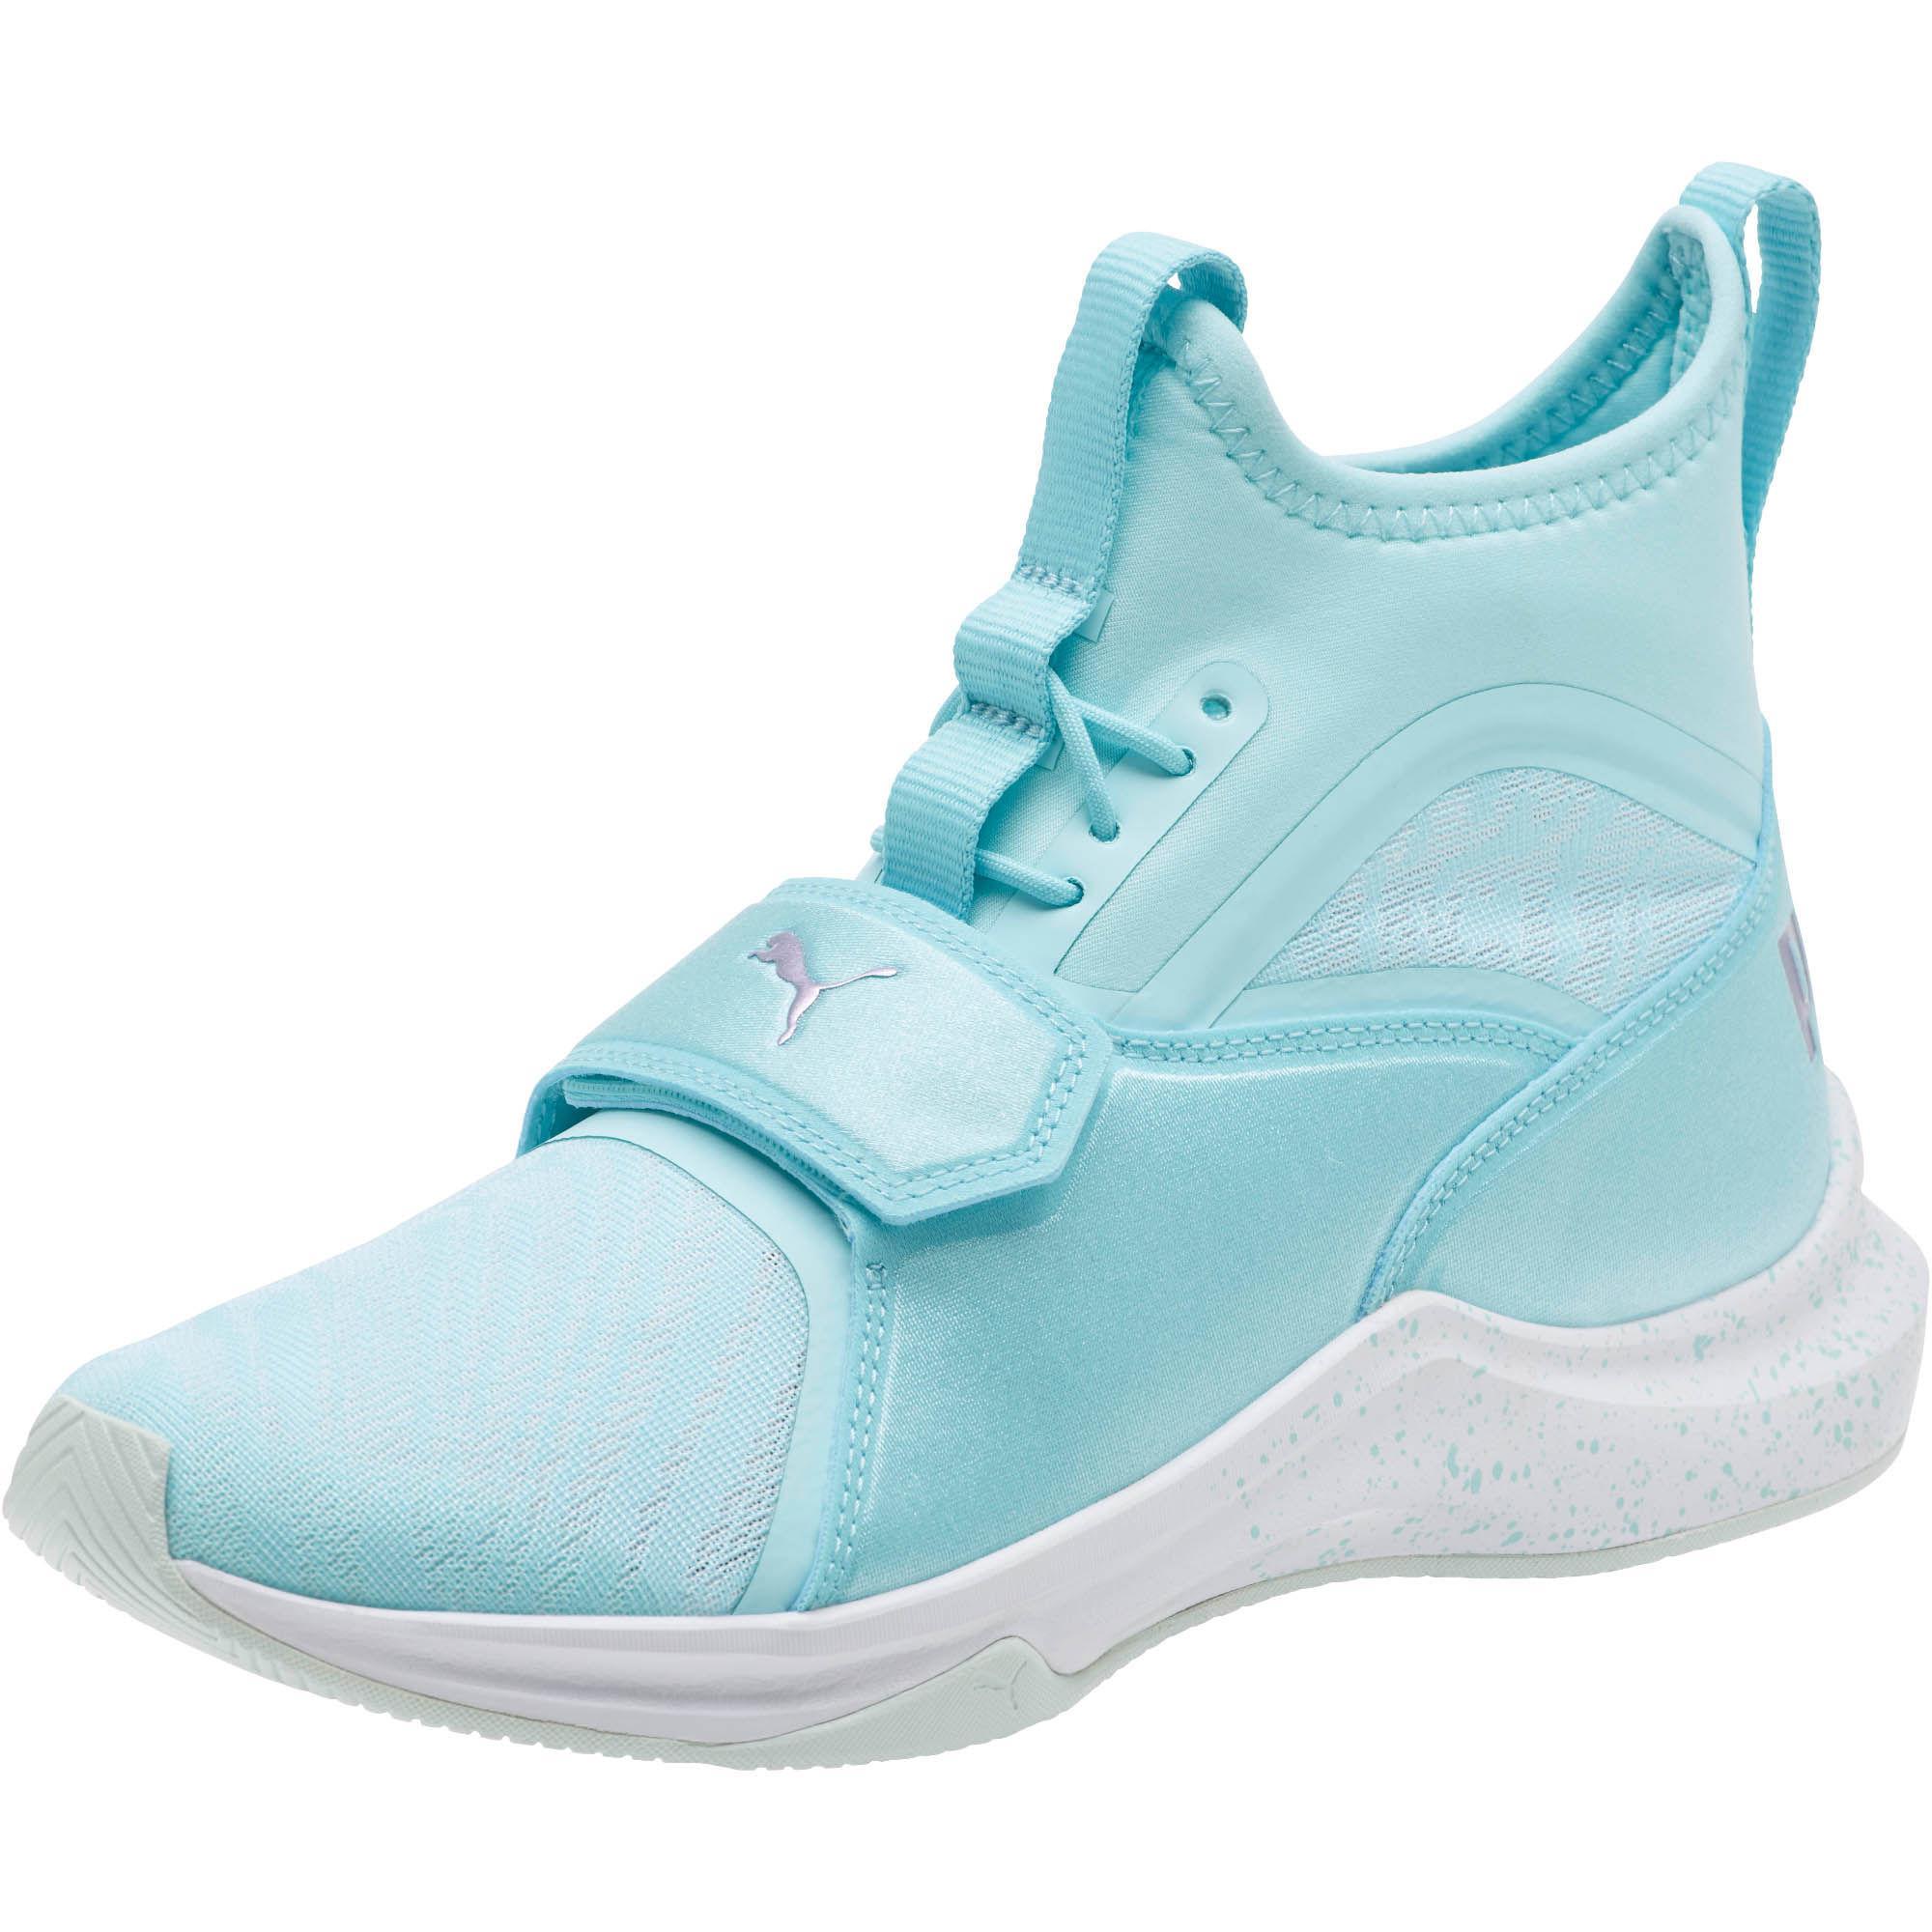 Lyst - PUMA Phenom Oceannaire Women s Training Shoes in Blue cb2bd4f62